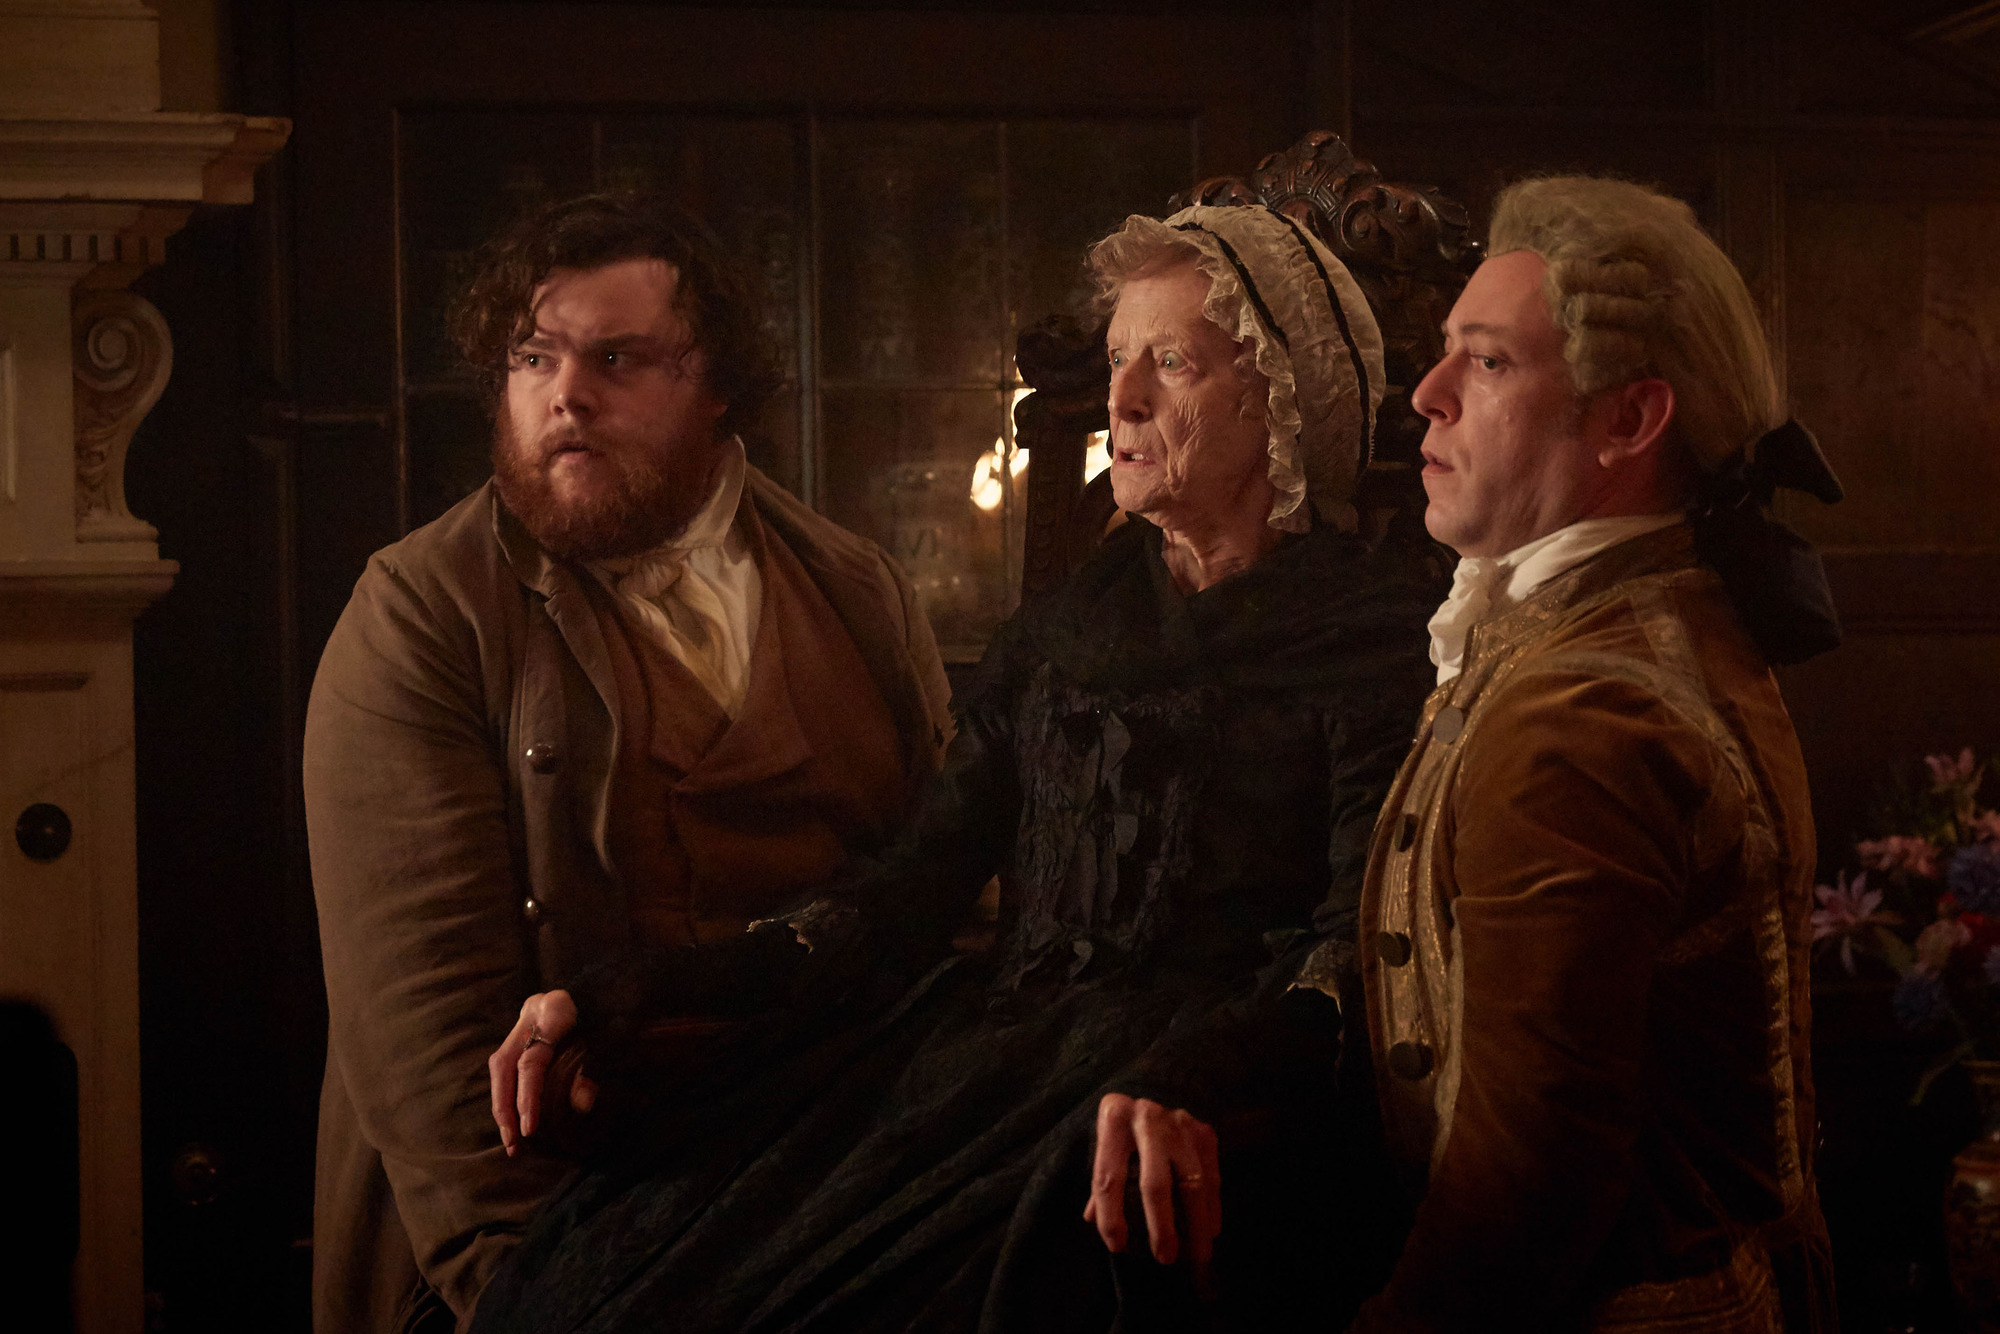 Tom Harry (TURLOUGH CONVERY), Aunt Agatha (CAROLINE BLAKISTON) - (C) Mammoth Screen - Photographer: Robert Viglasky